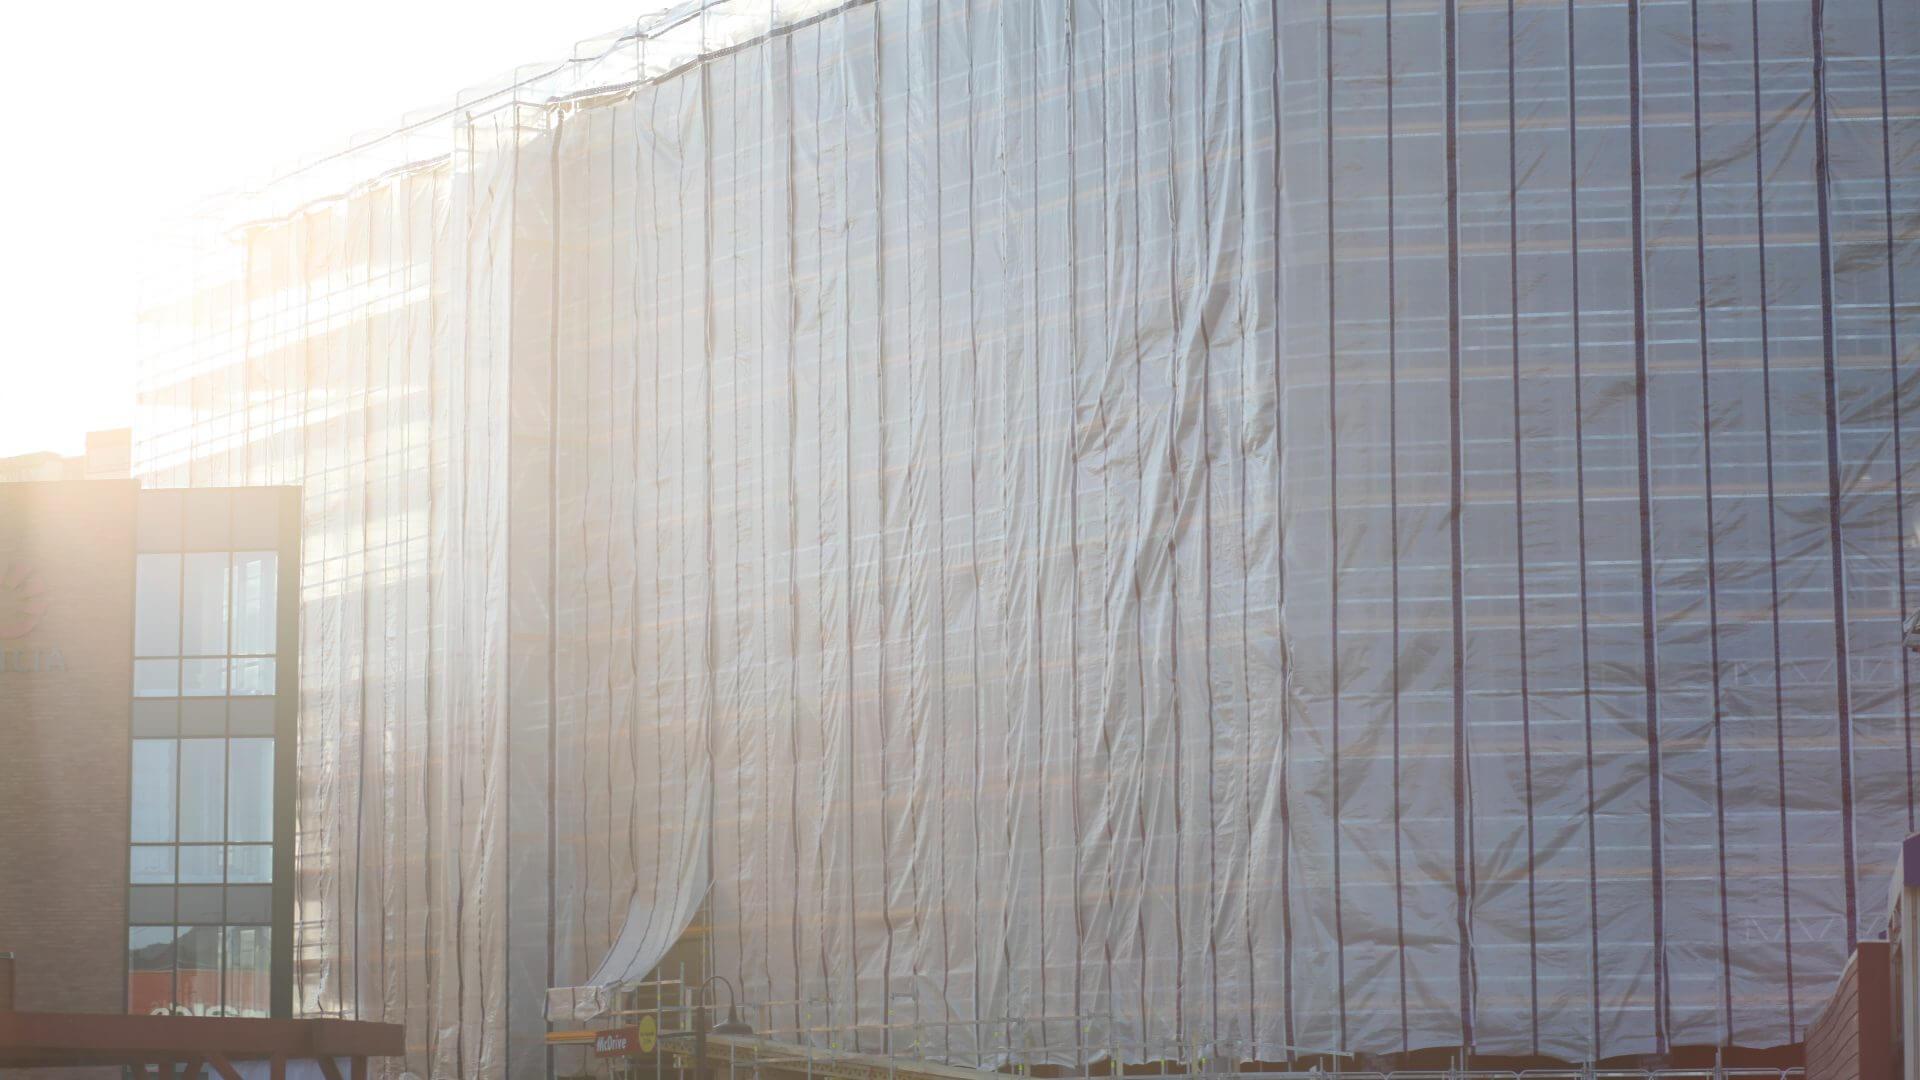 obwiik presenning teknisk tekstil stillasinndekking